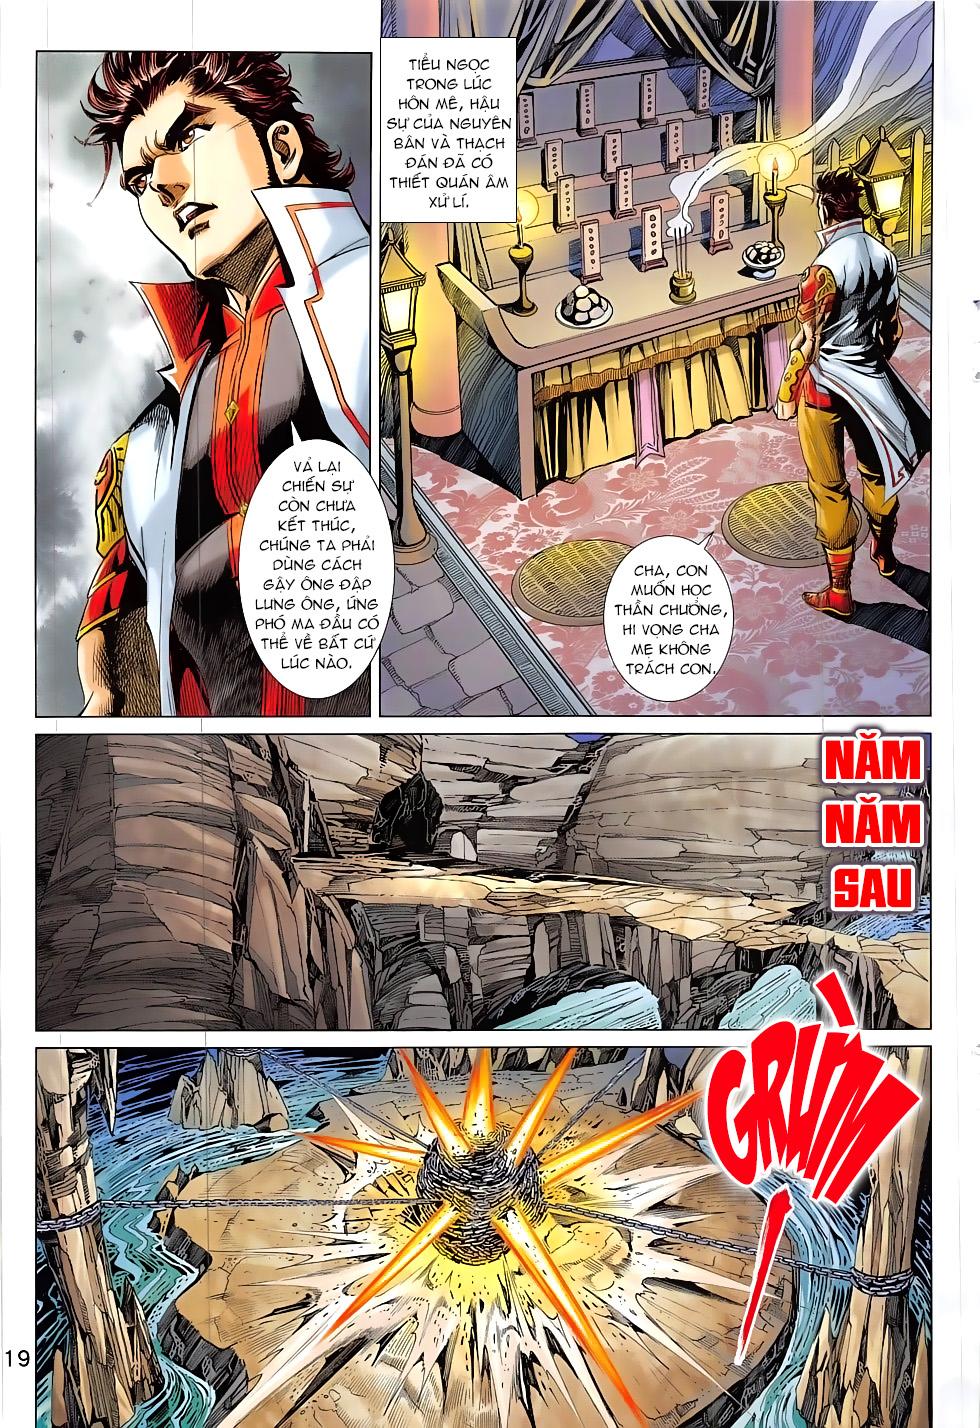 Thần Chưởng chap 24 – End Trang 19 - Mangak.info